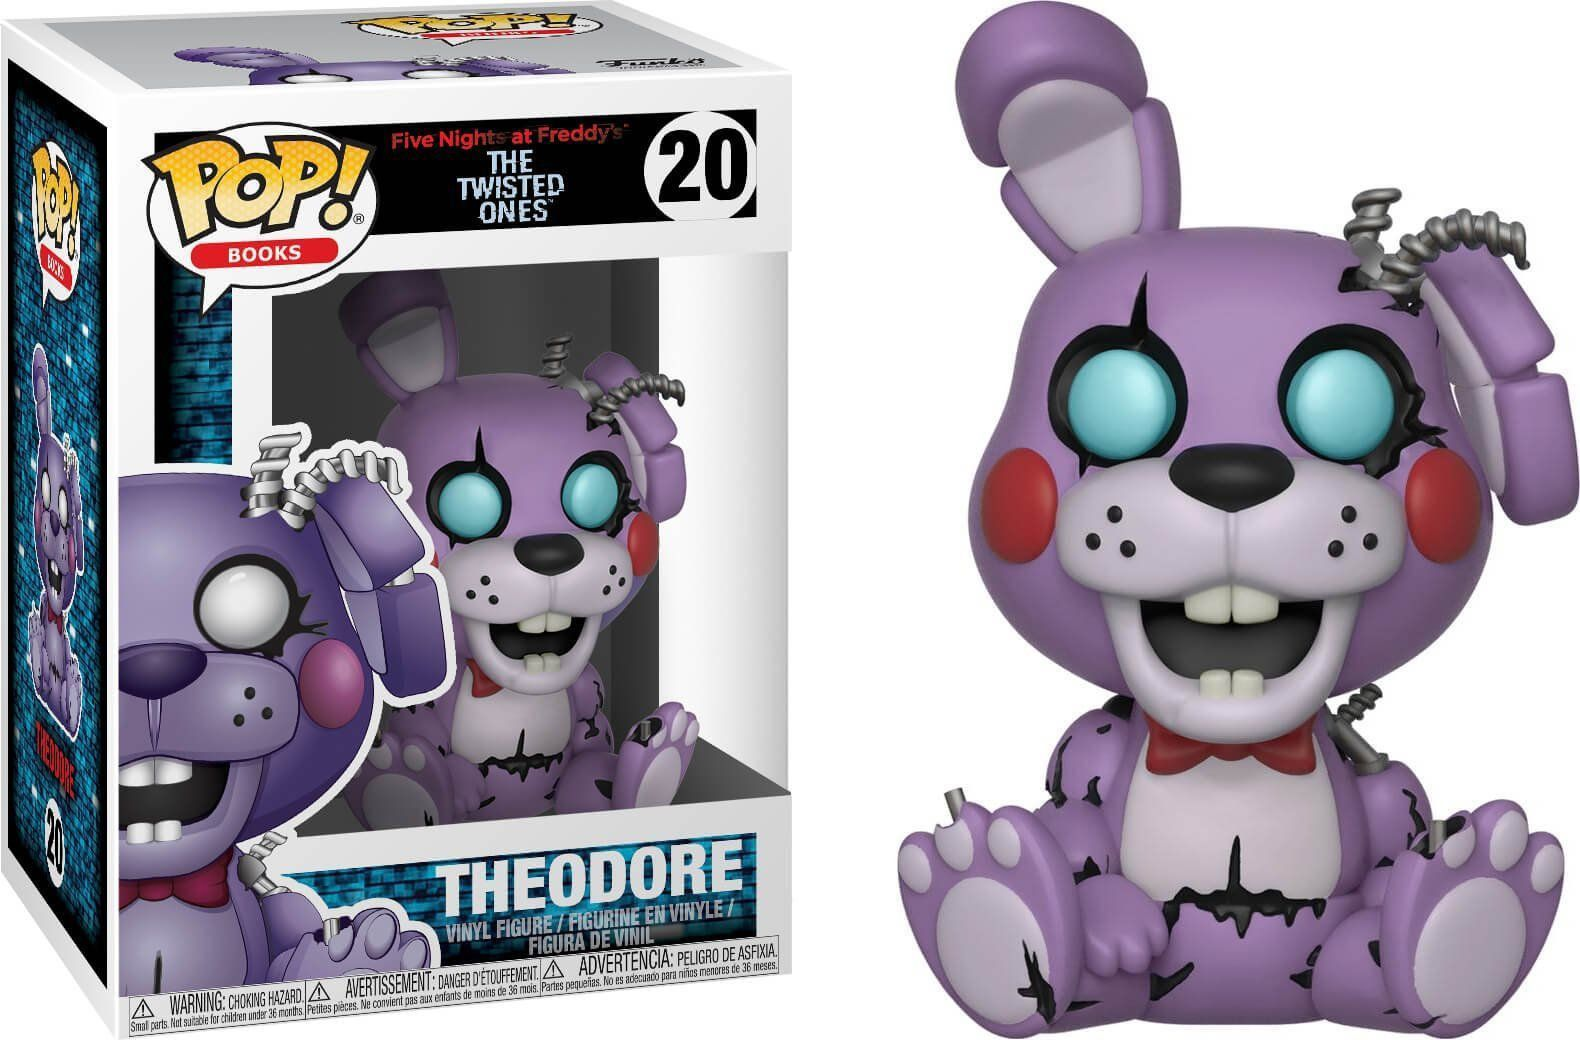 PRÉ VENDA: Funko Pop! Theodore: The Twisted Ones (FNAF) #20 - Funko